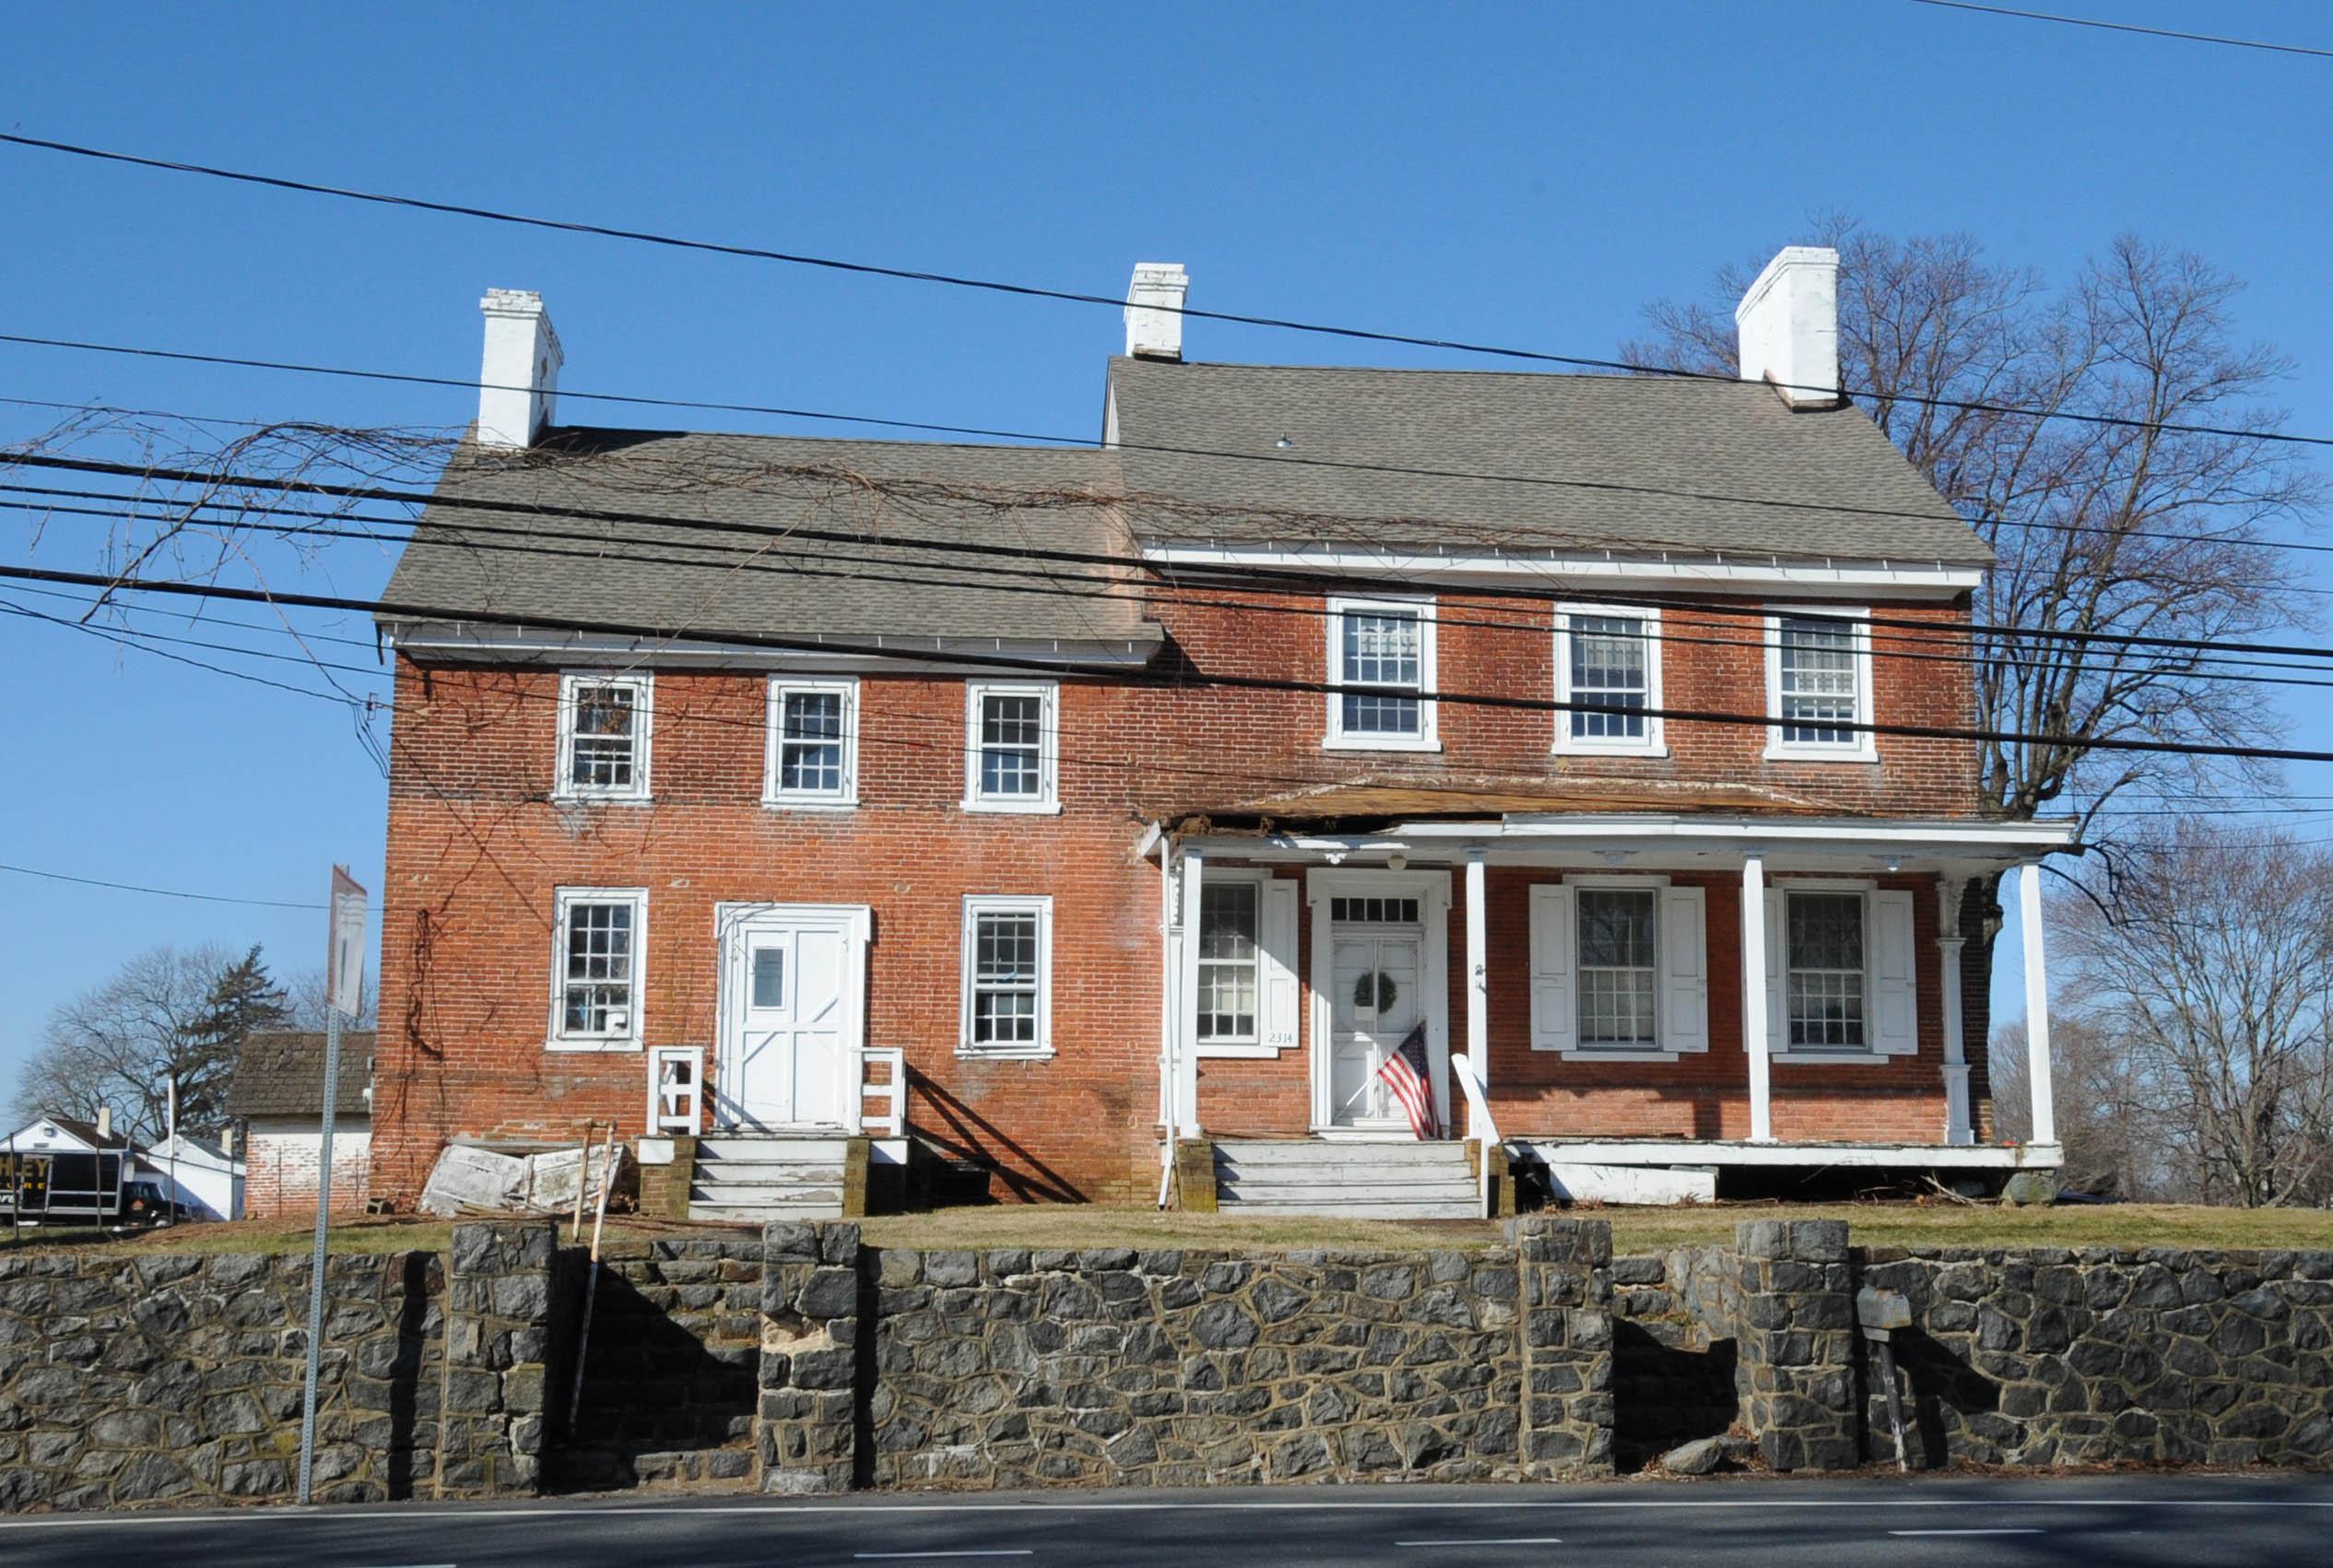 Aiken County Building Inspections